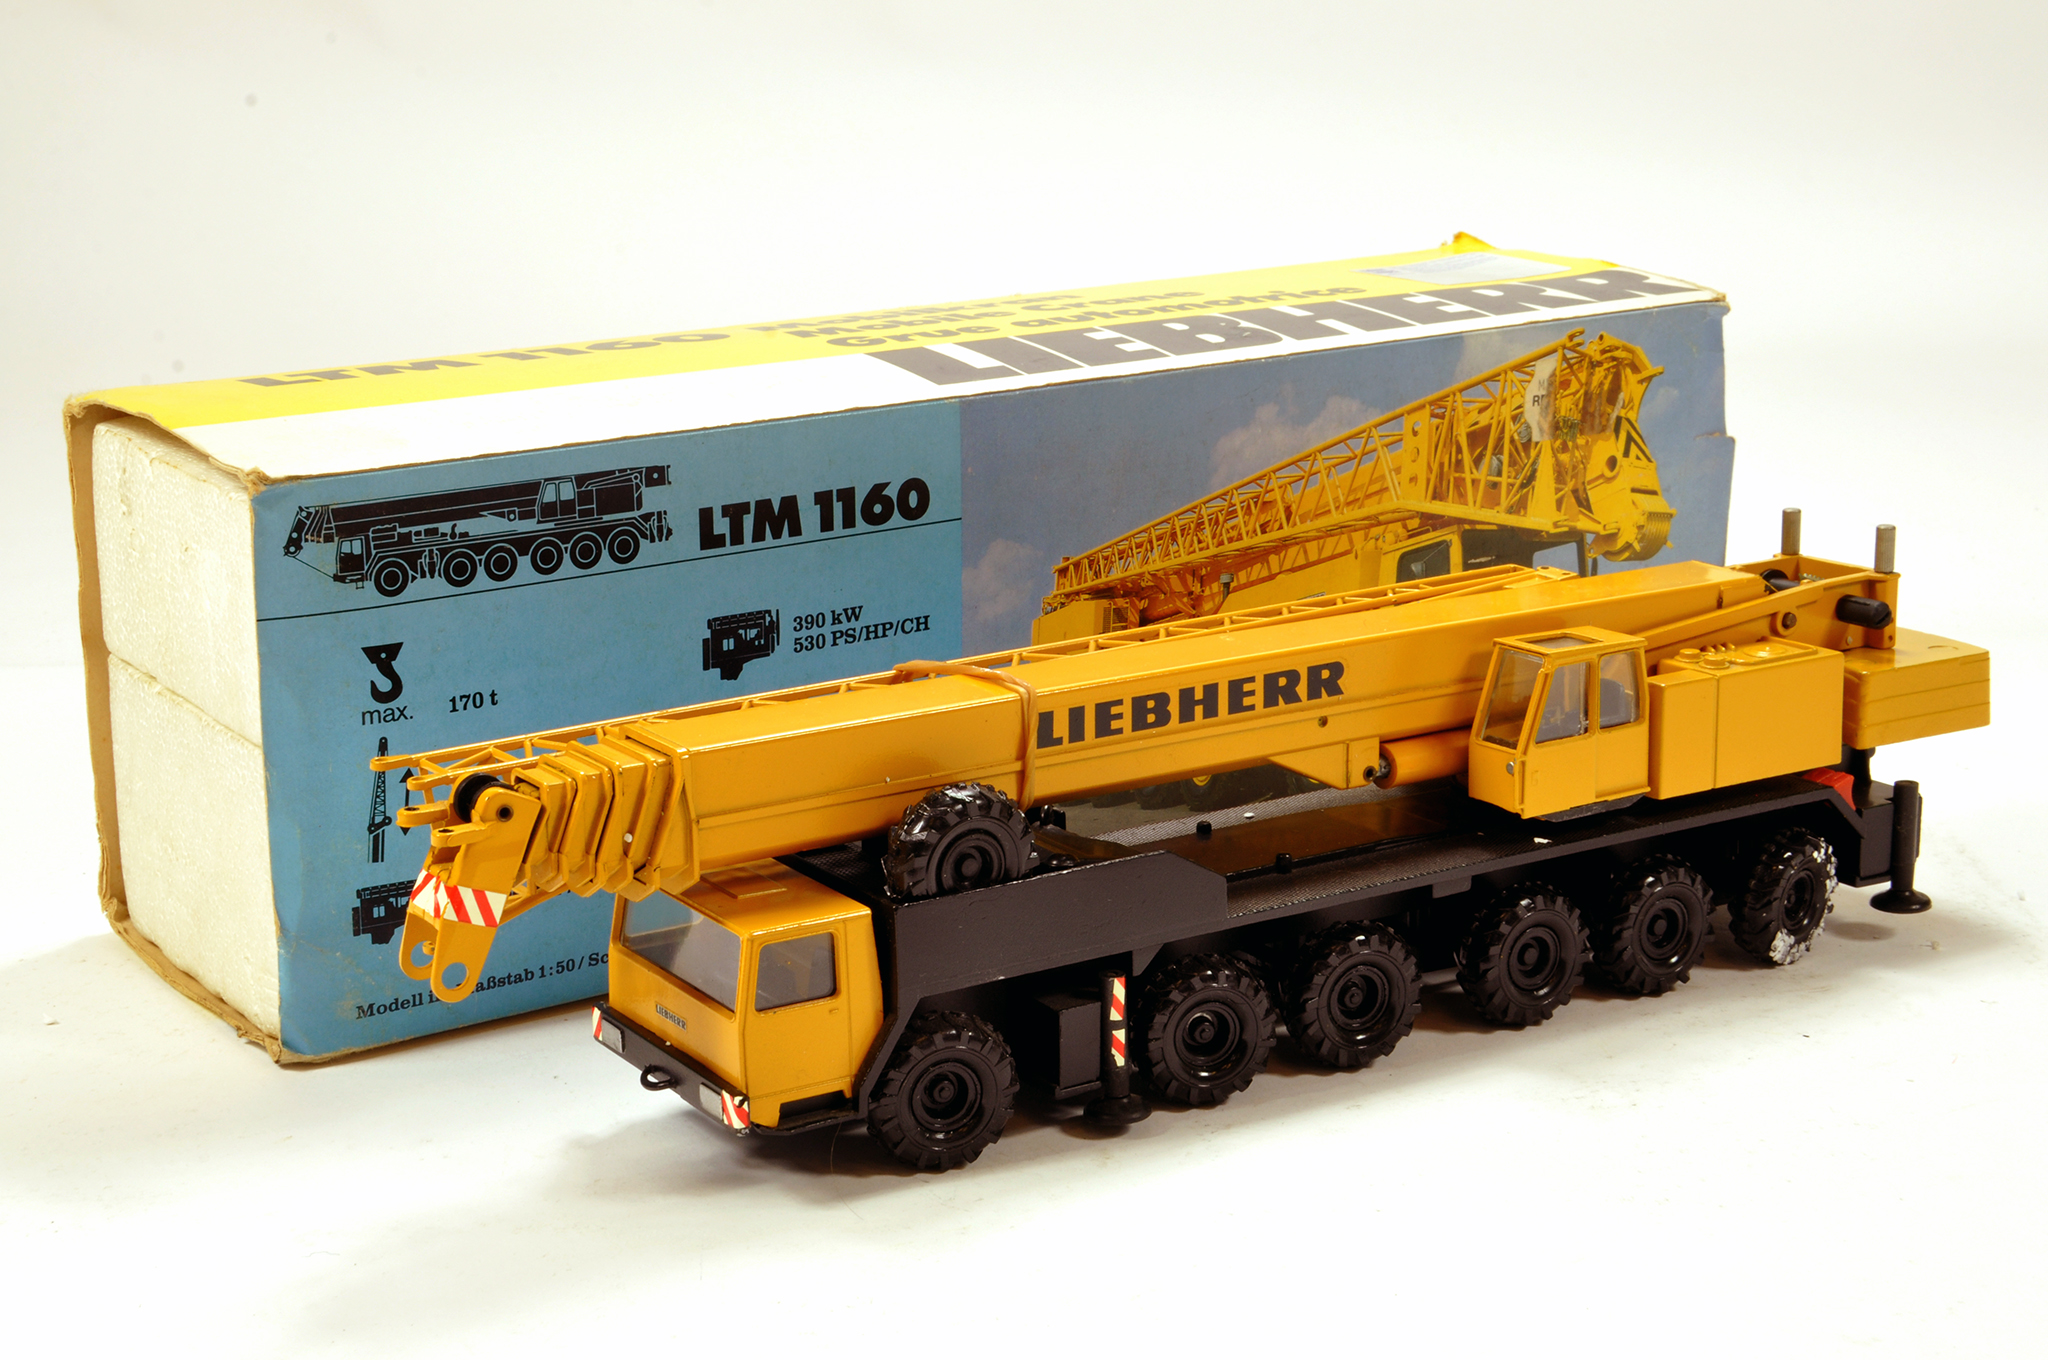 Lot 345 - Conrad 1/50 construction issue comprising Liebherr LTM1160 Mobile Crane. E to NM.